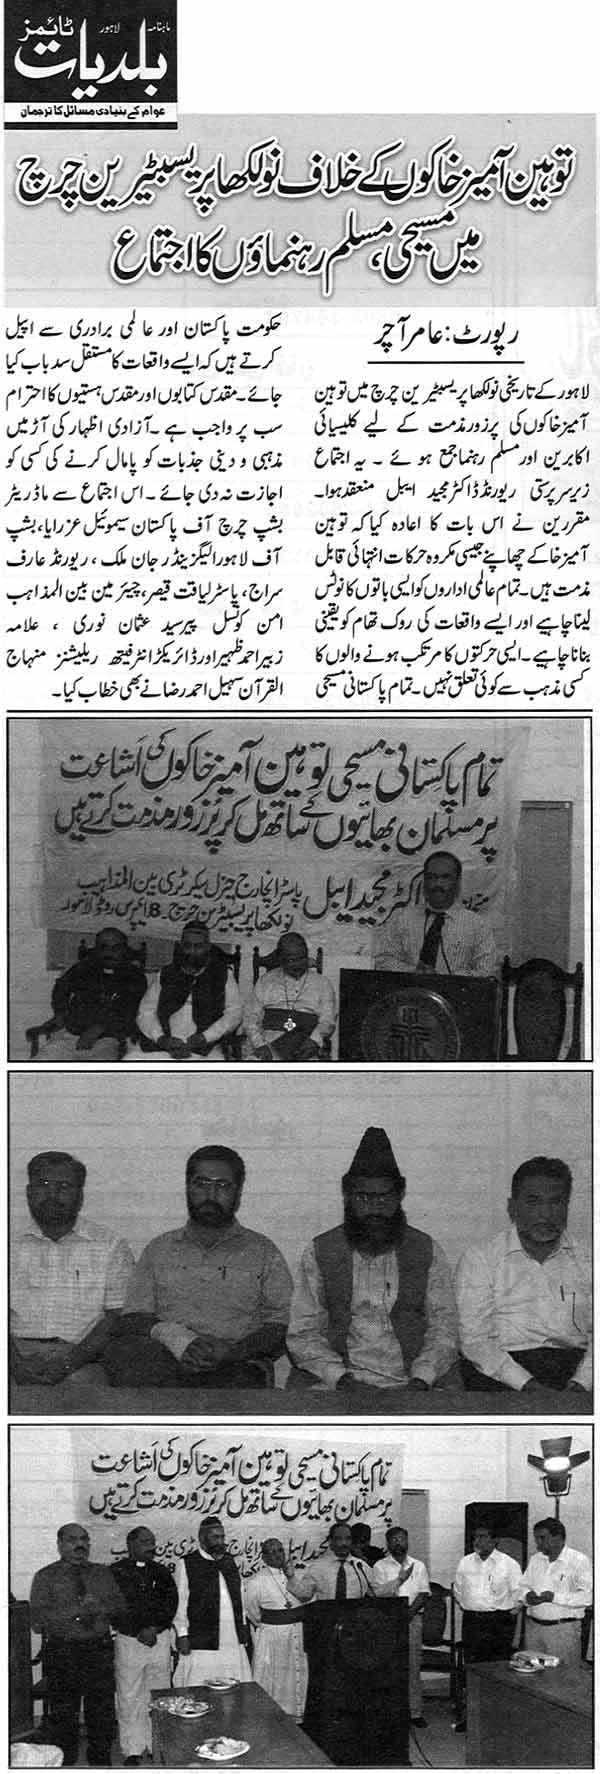 تحریک منہاج القرآن Minhaj-ul-Quran  Print Media Coverage پرنٹ میڈیا کوریج Monthly Baldiyat Times Lahore Page: 20